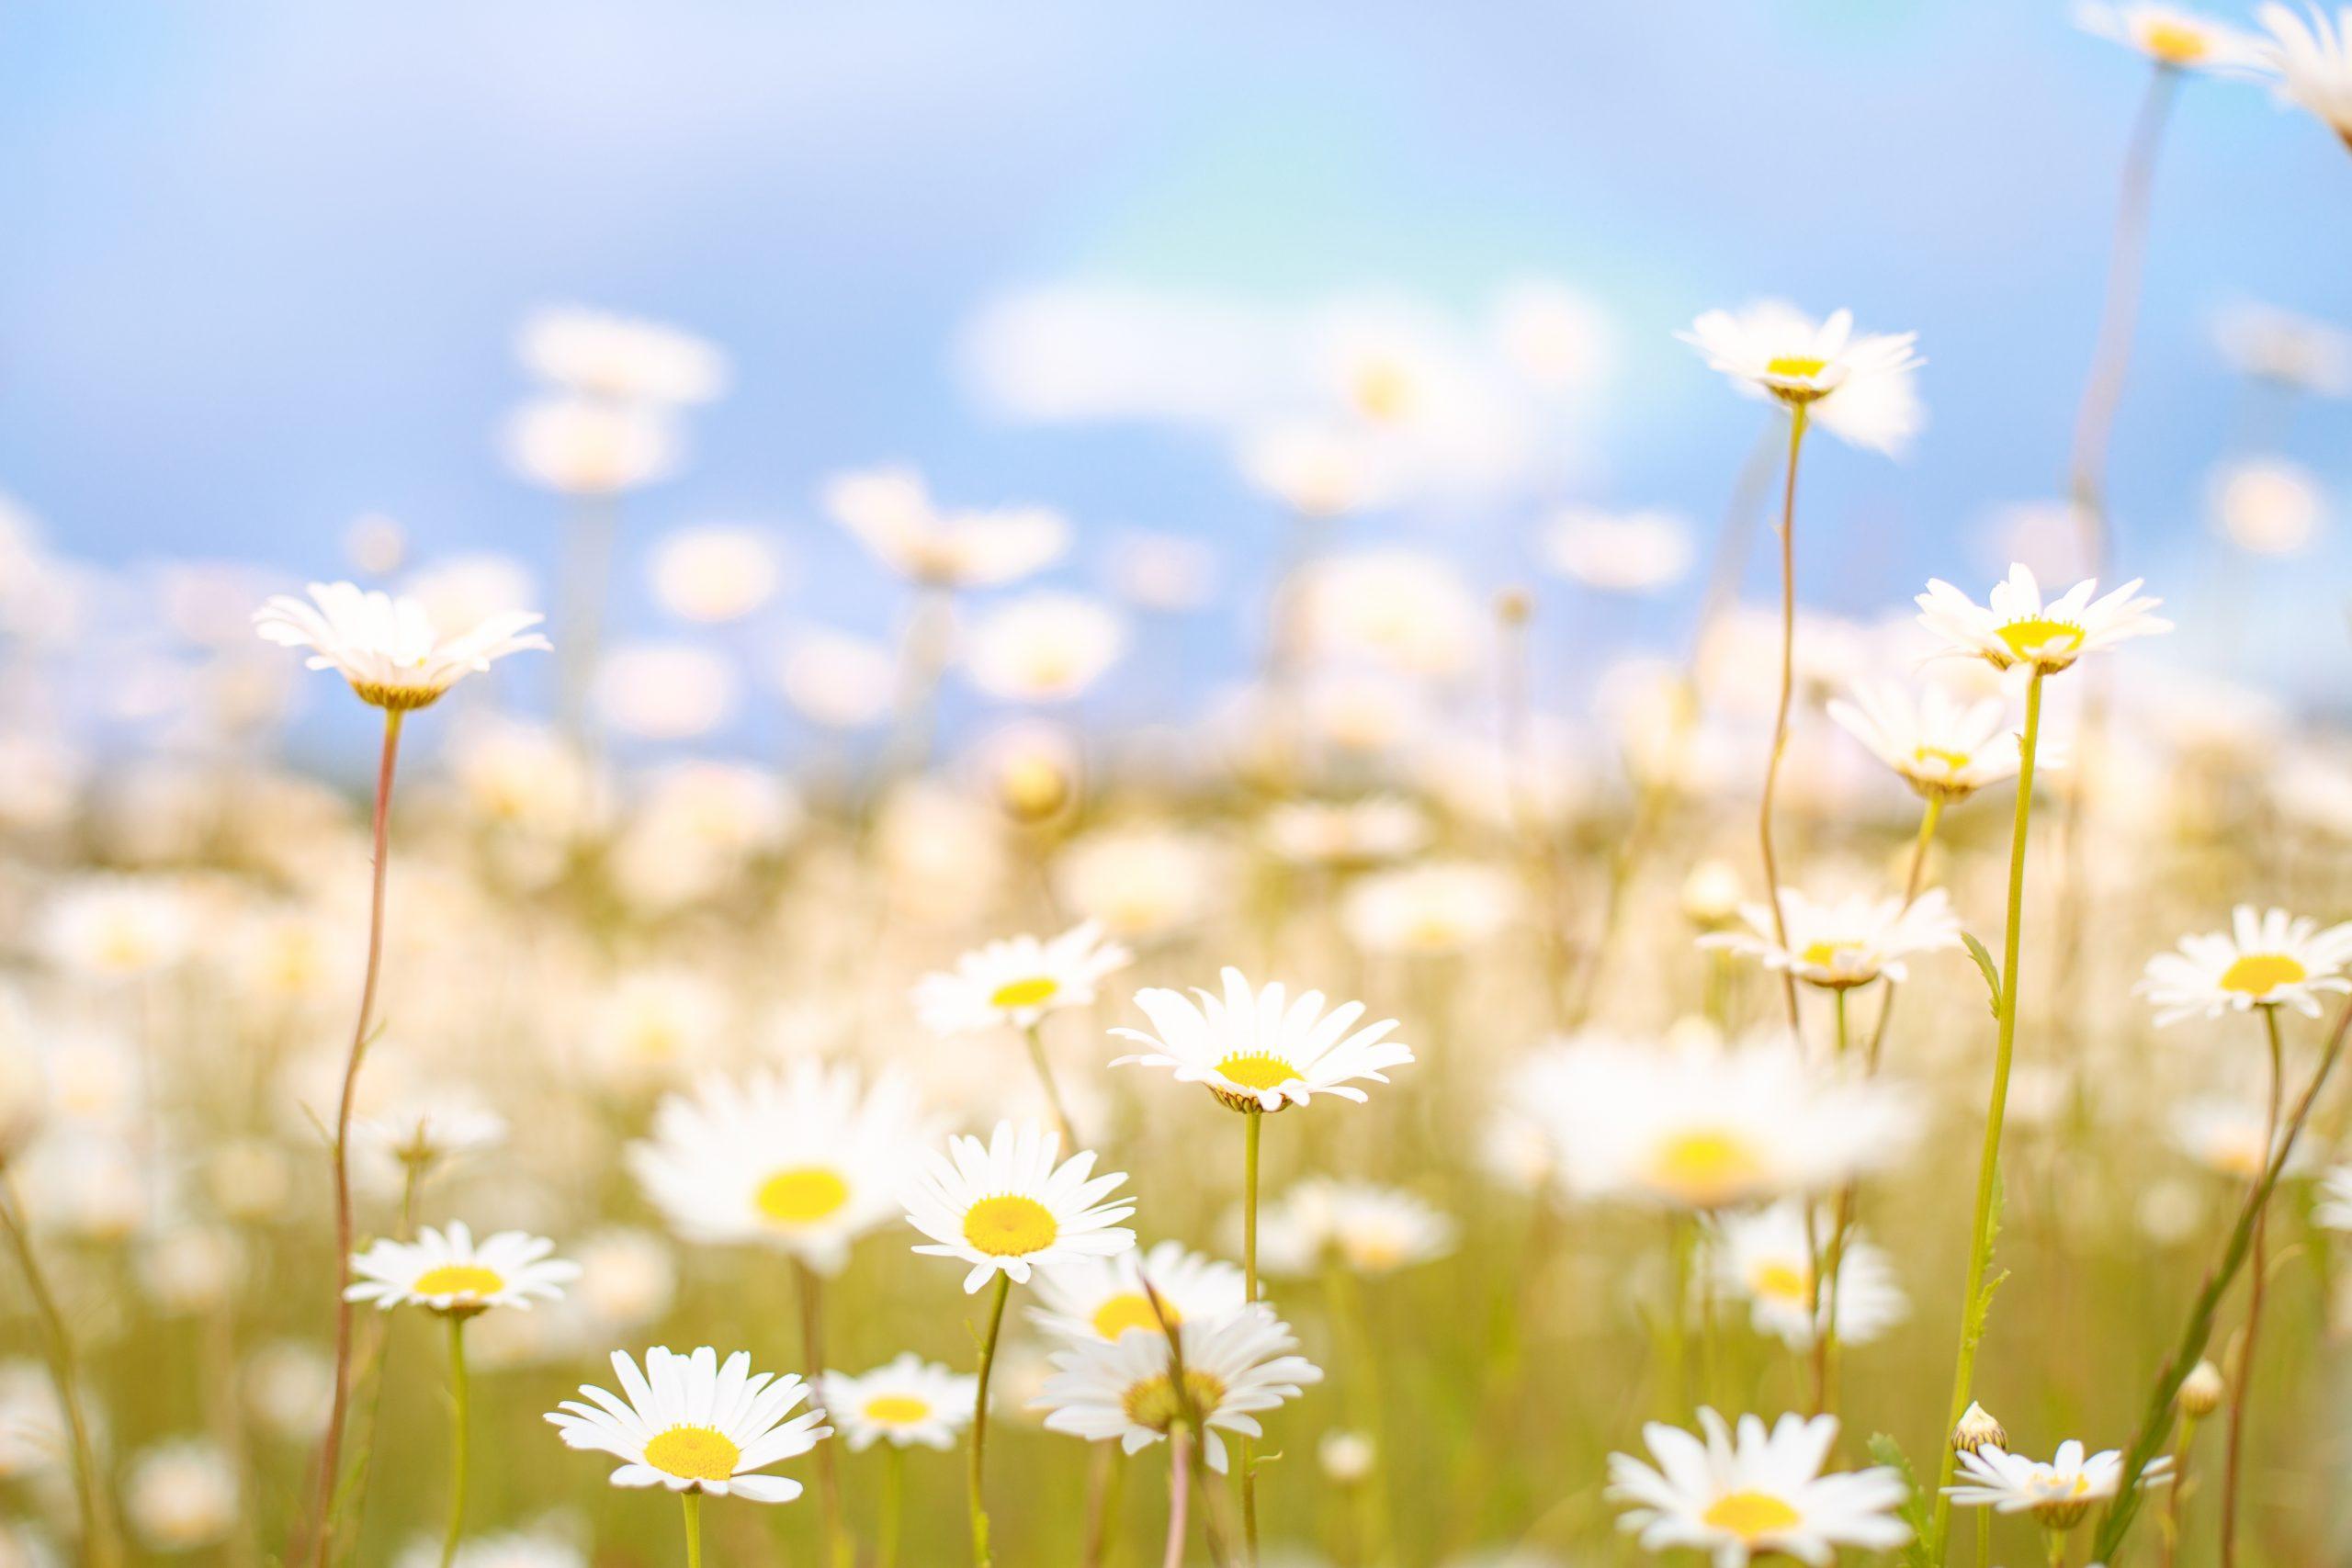 Veja 6 dicas para viajar na primavera!